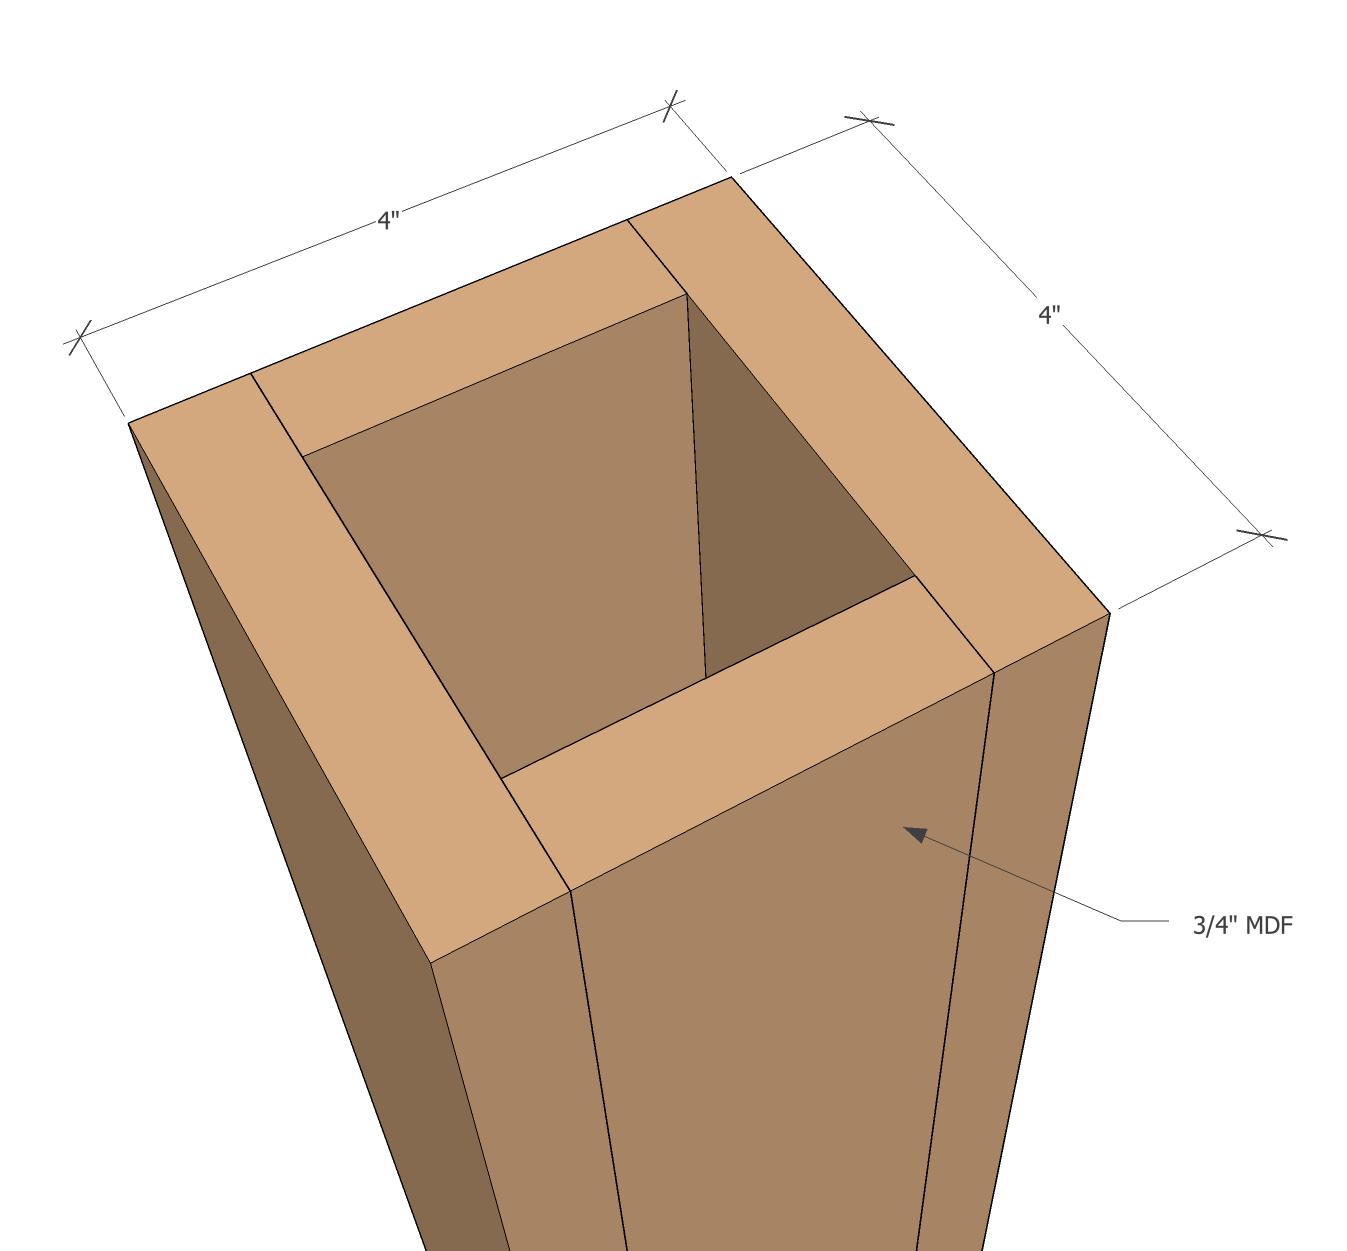 mdf furniture design. Furniture Design With MDF Mdf T